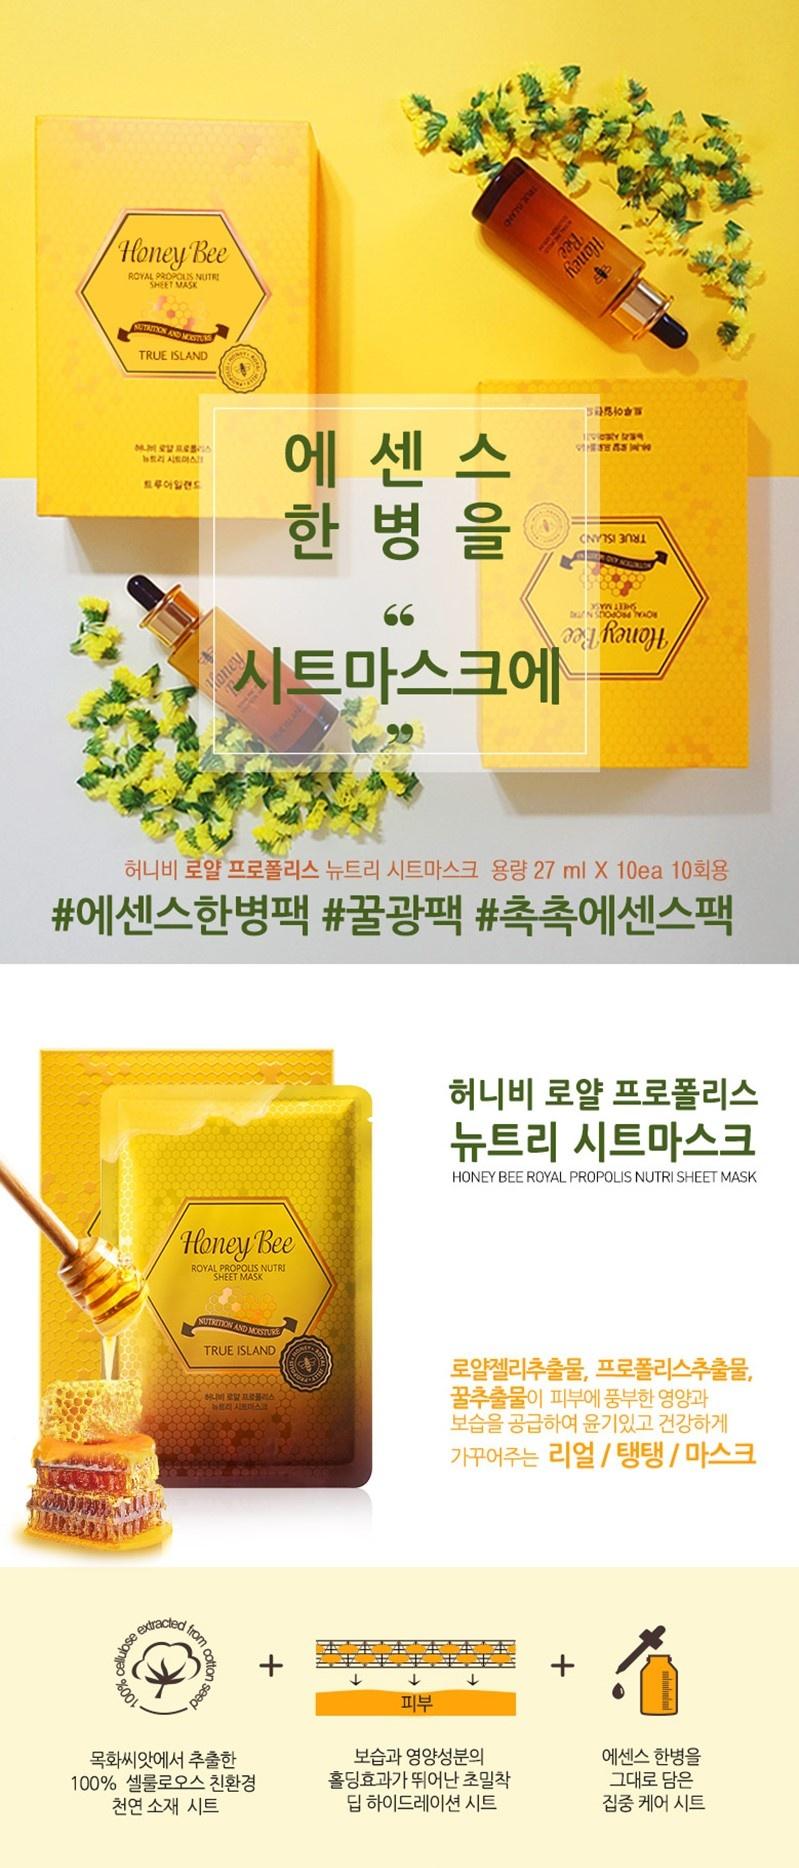 True Island Honey Bee Royal Propolis Nutri Sheet Mask-2